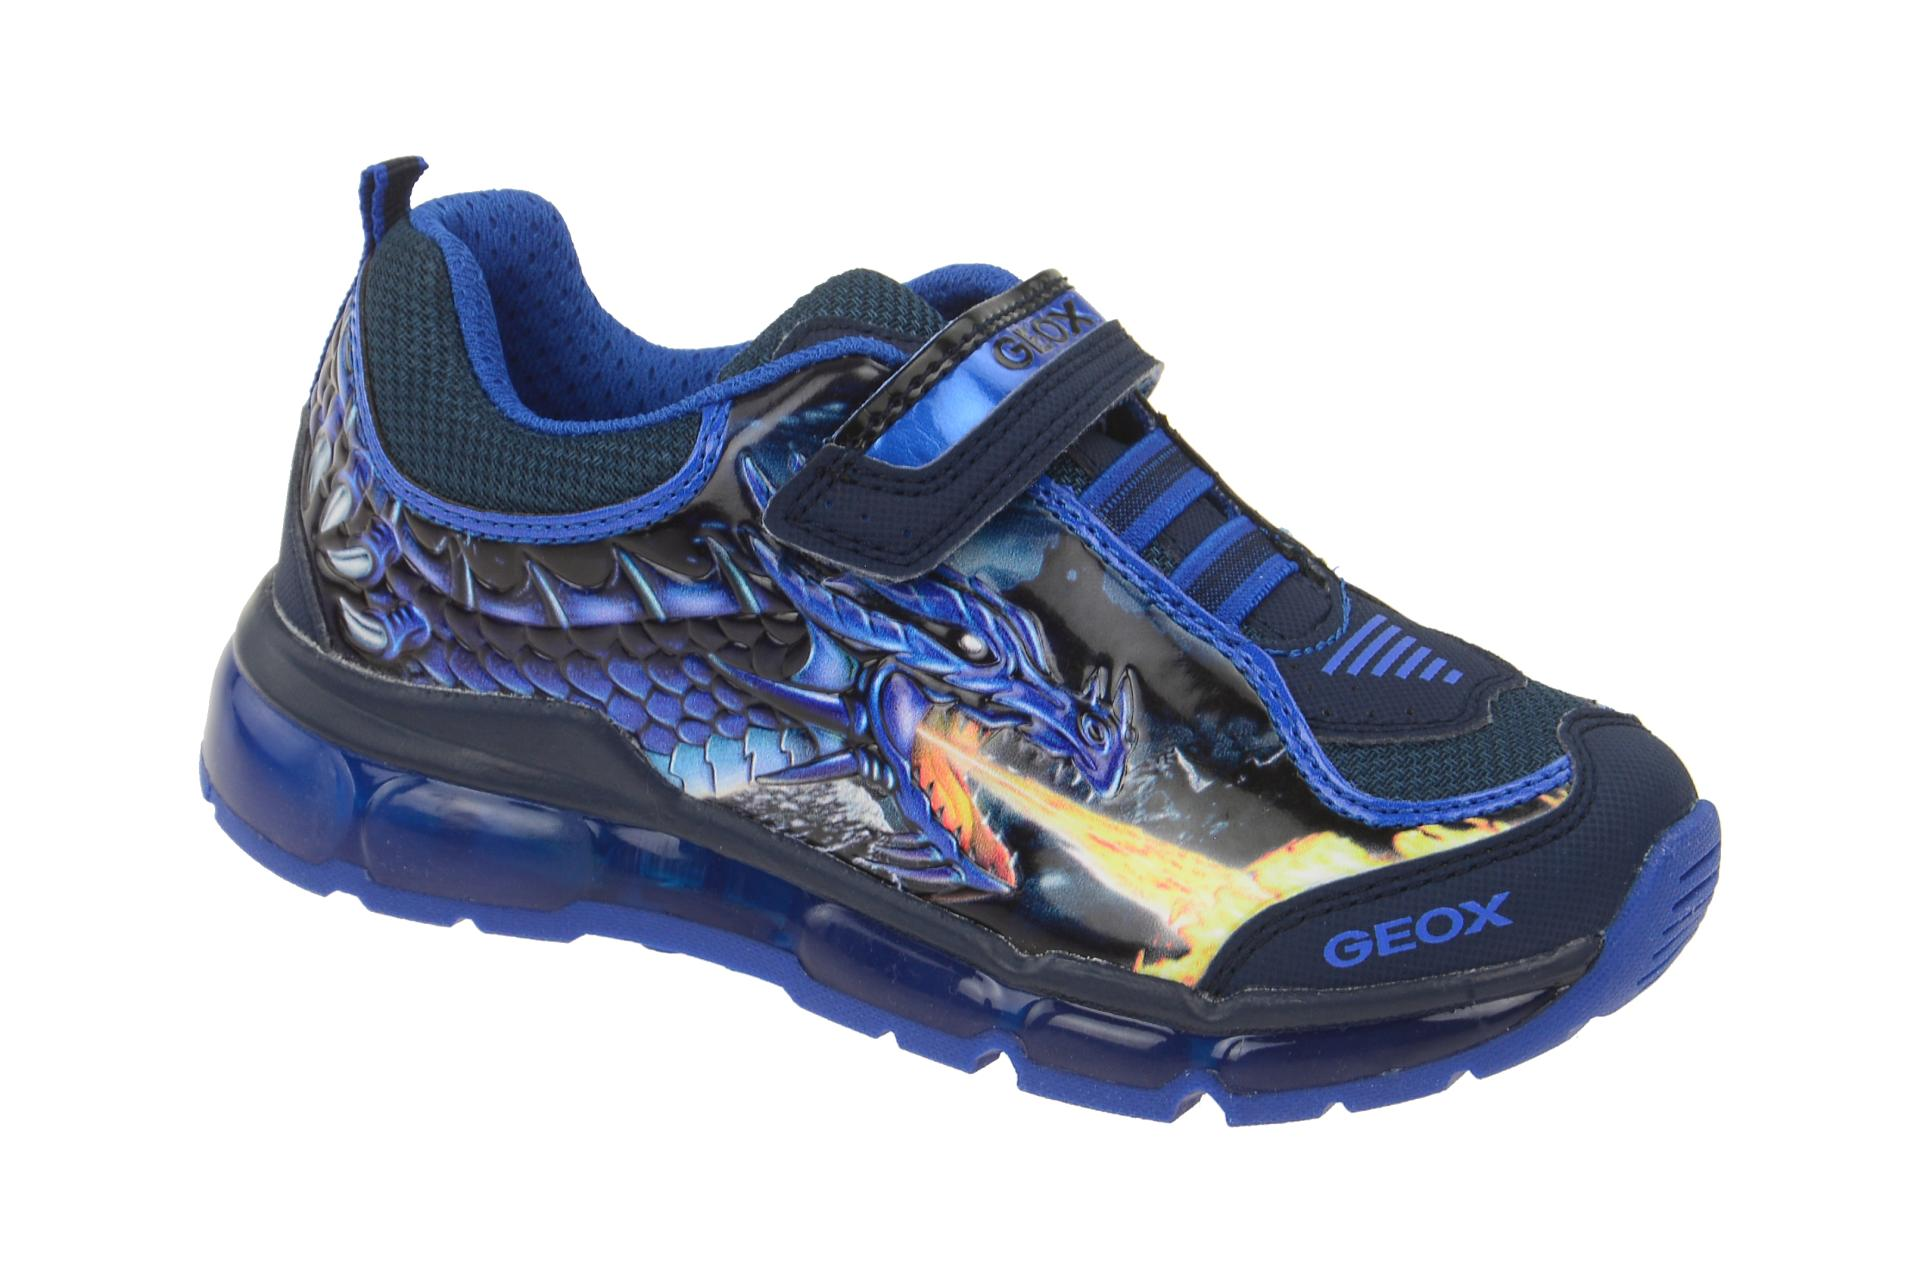 Geox Android Schuhe blau Drachen Blinker J6444A